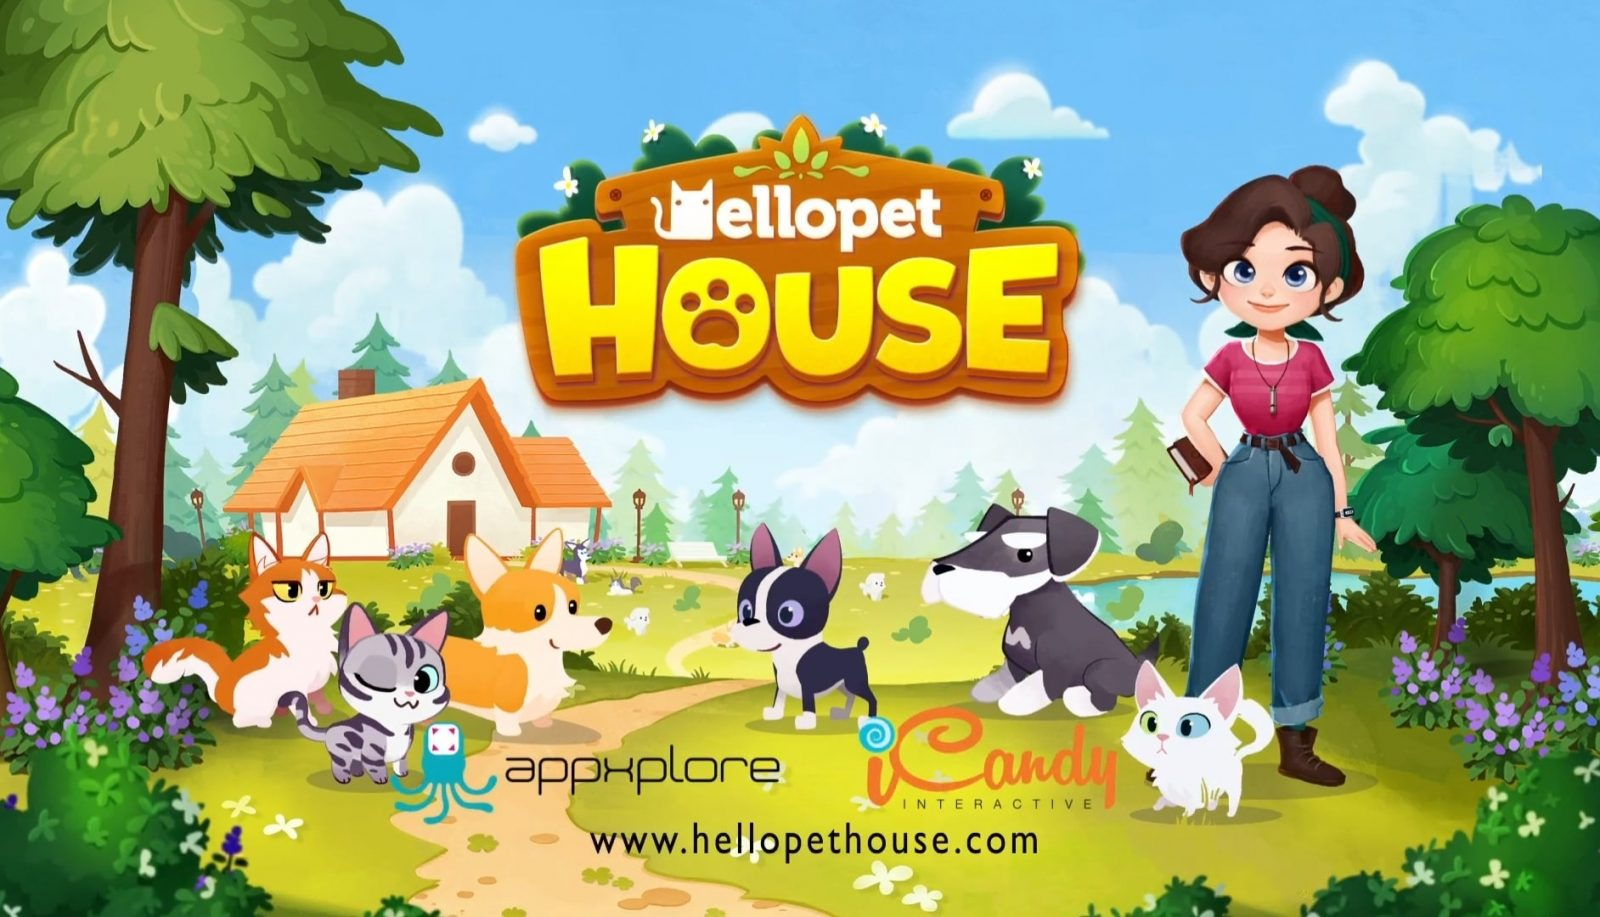 Hellopet House